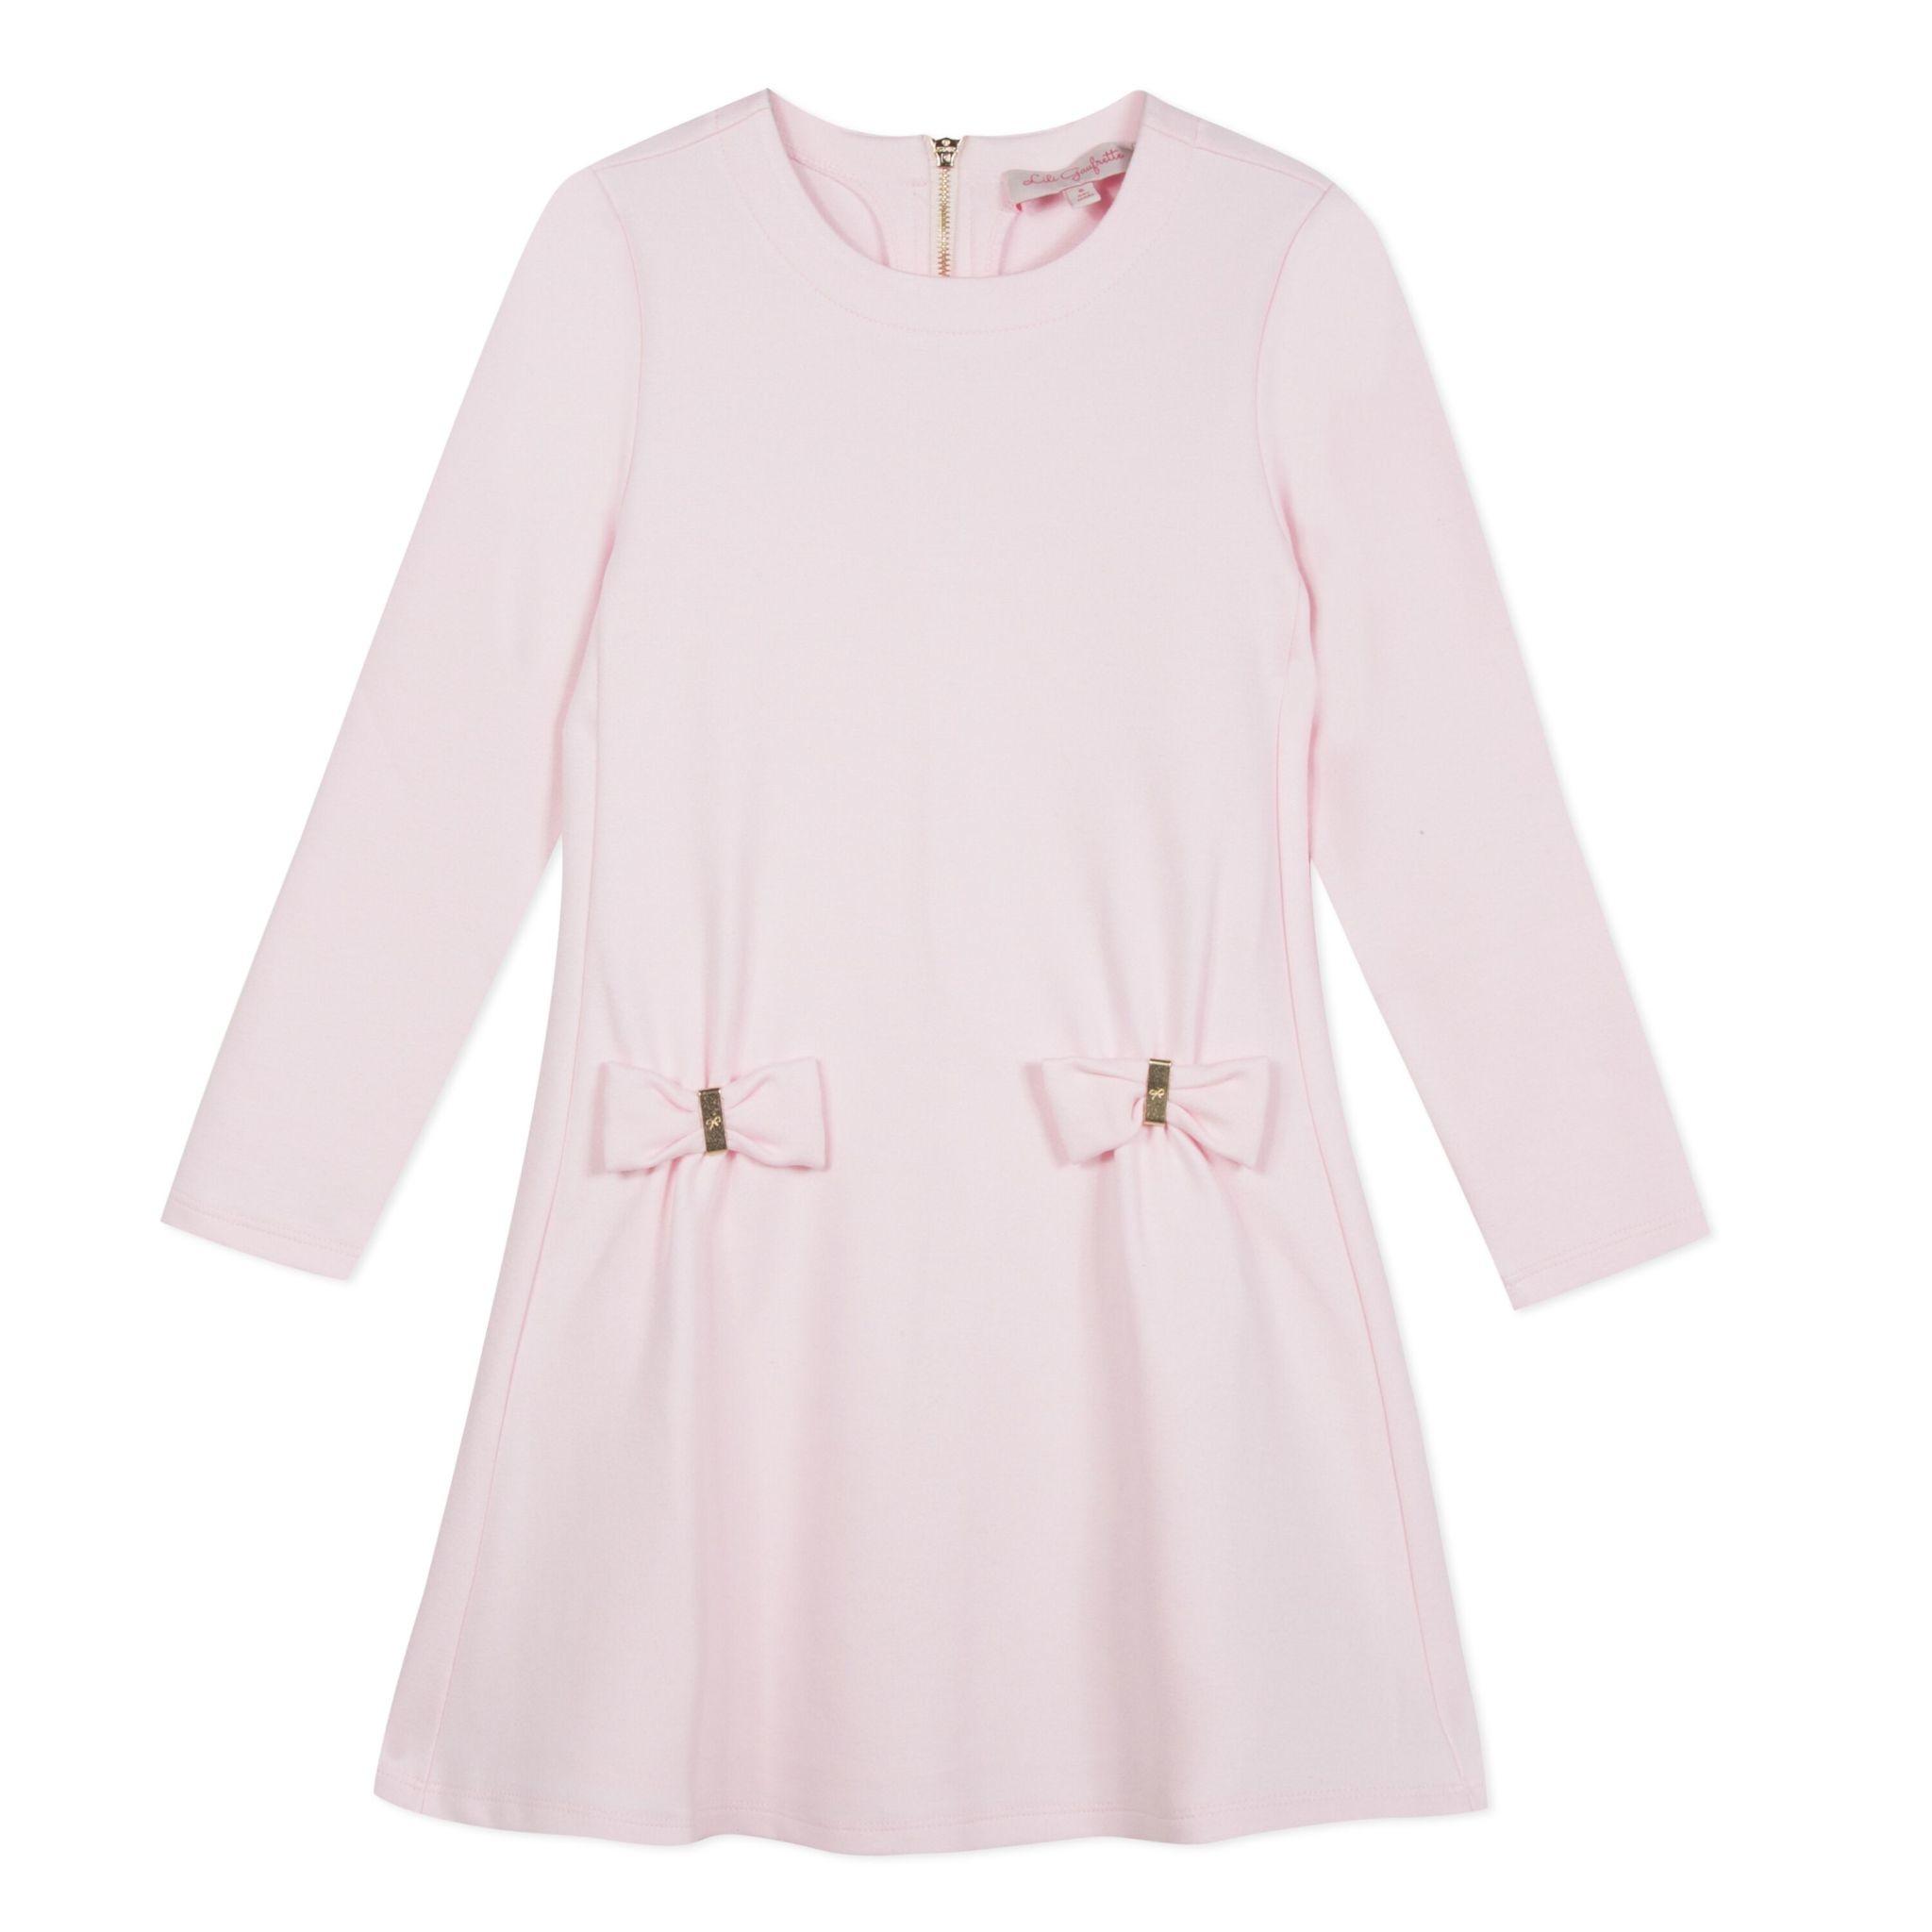 Lili Gaufrette Lili Gaufrette Pink Bow Dress